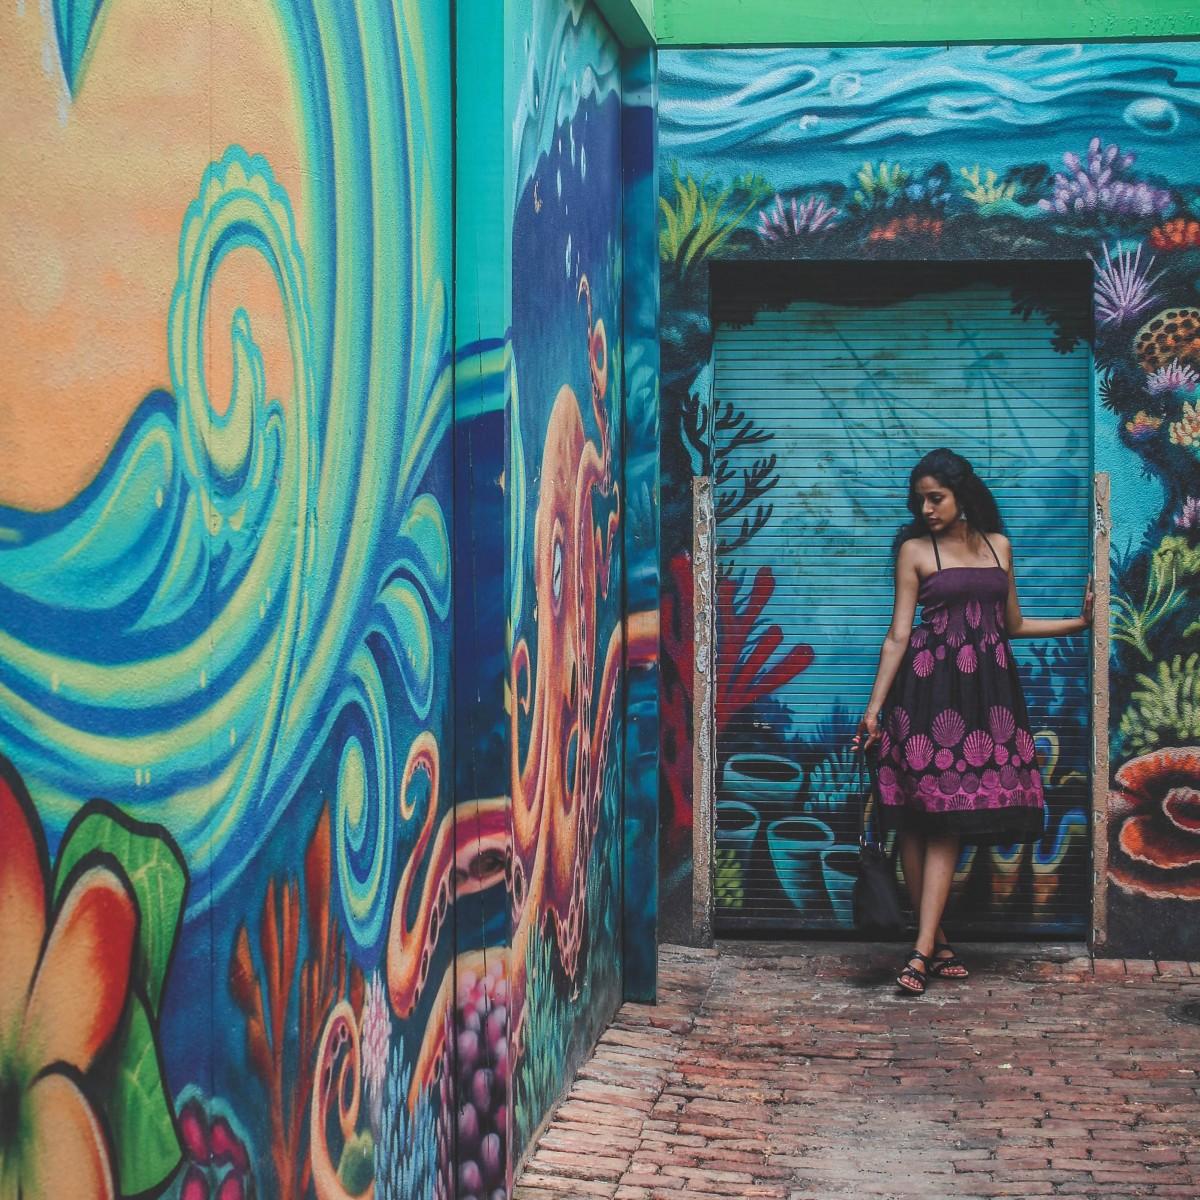 Street art mural in Clearwater Beach